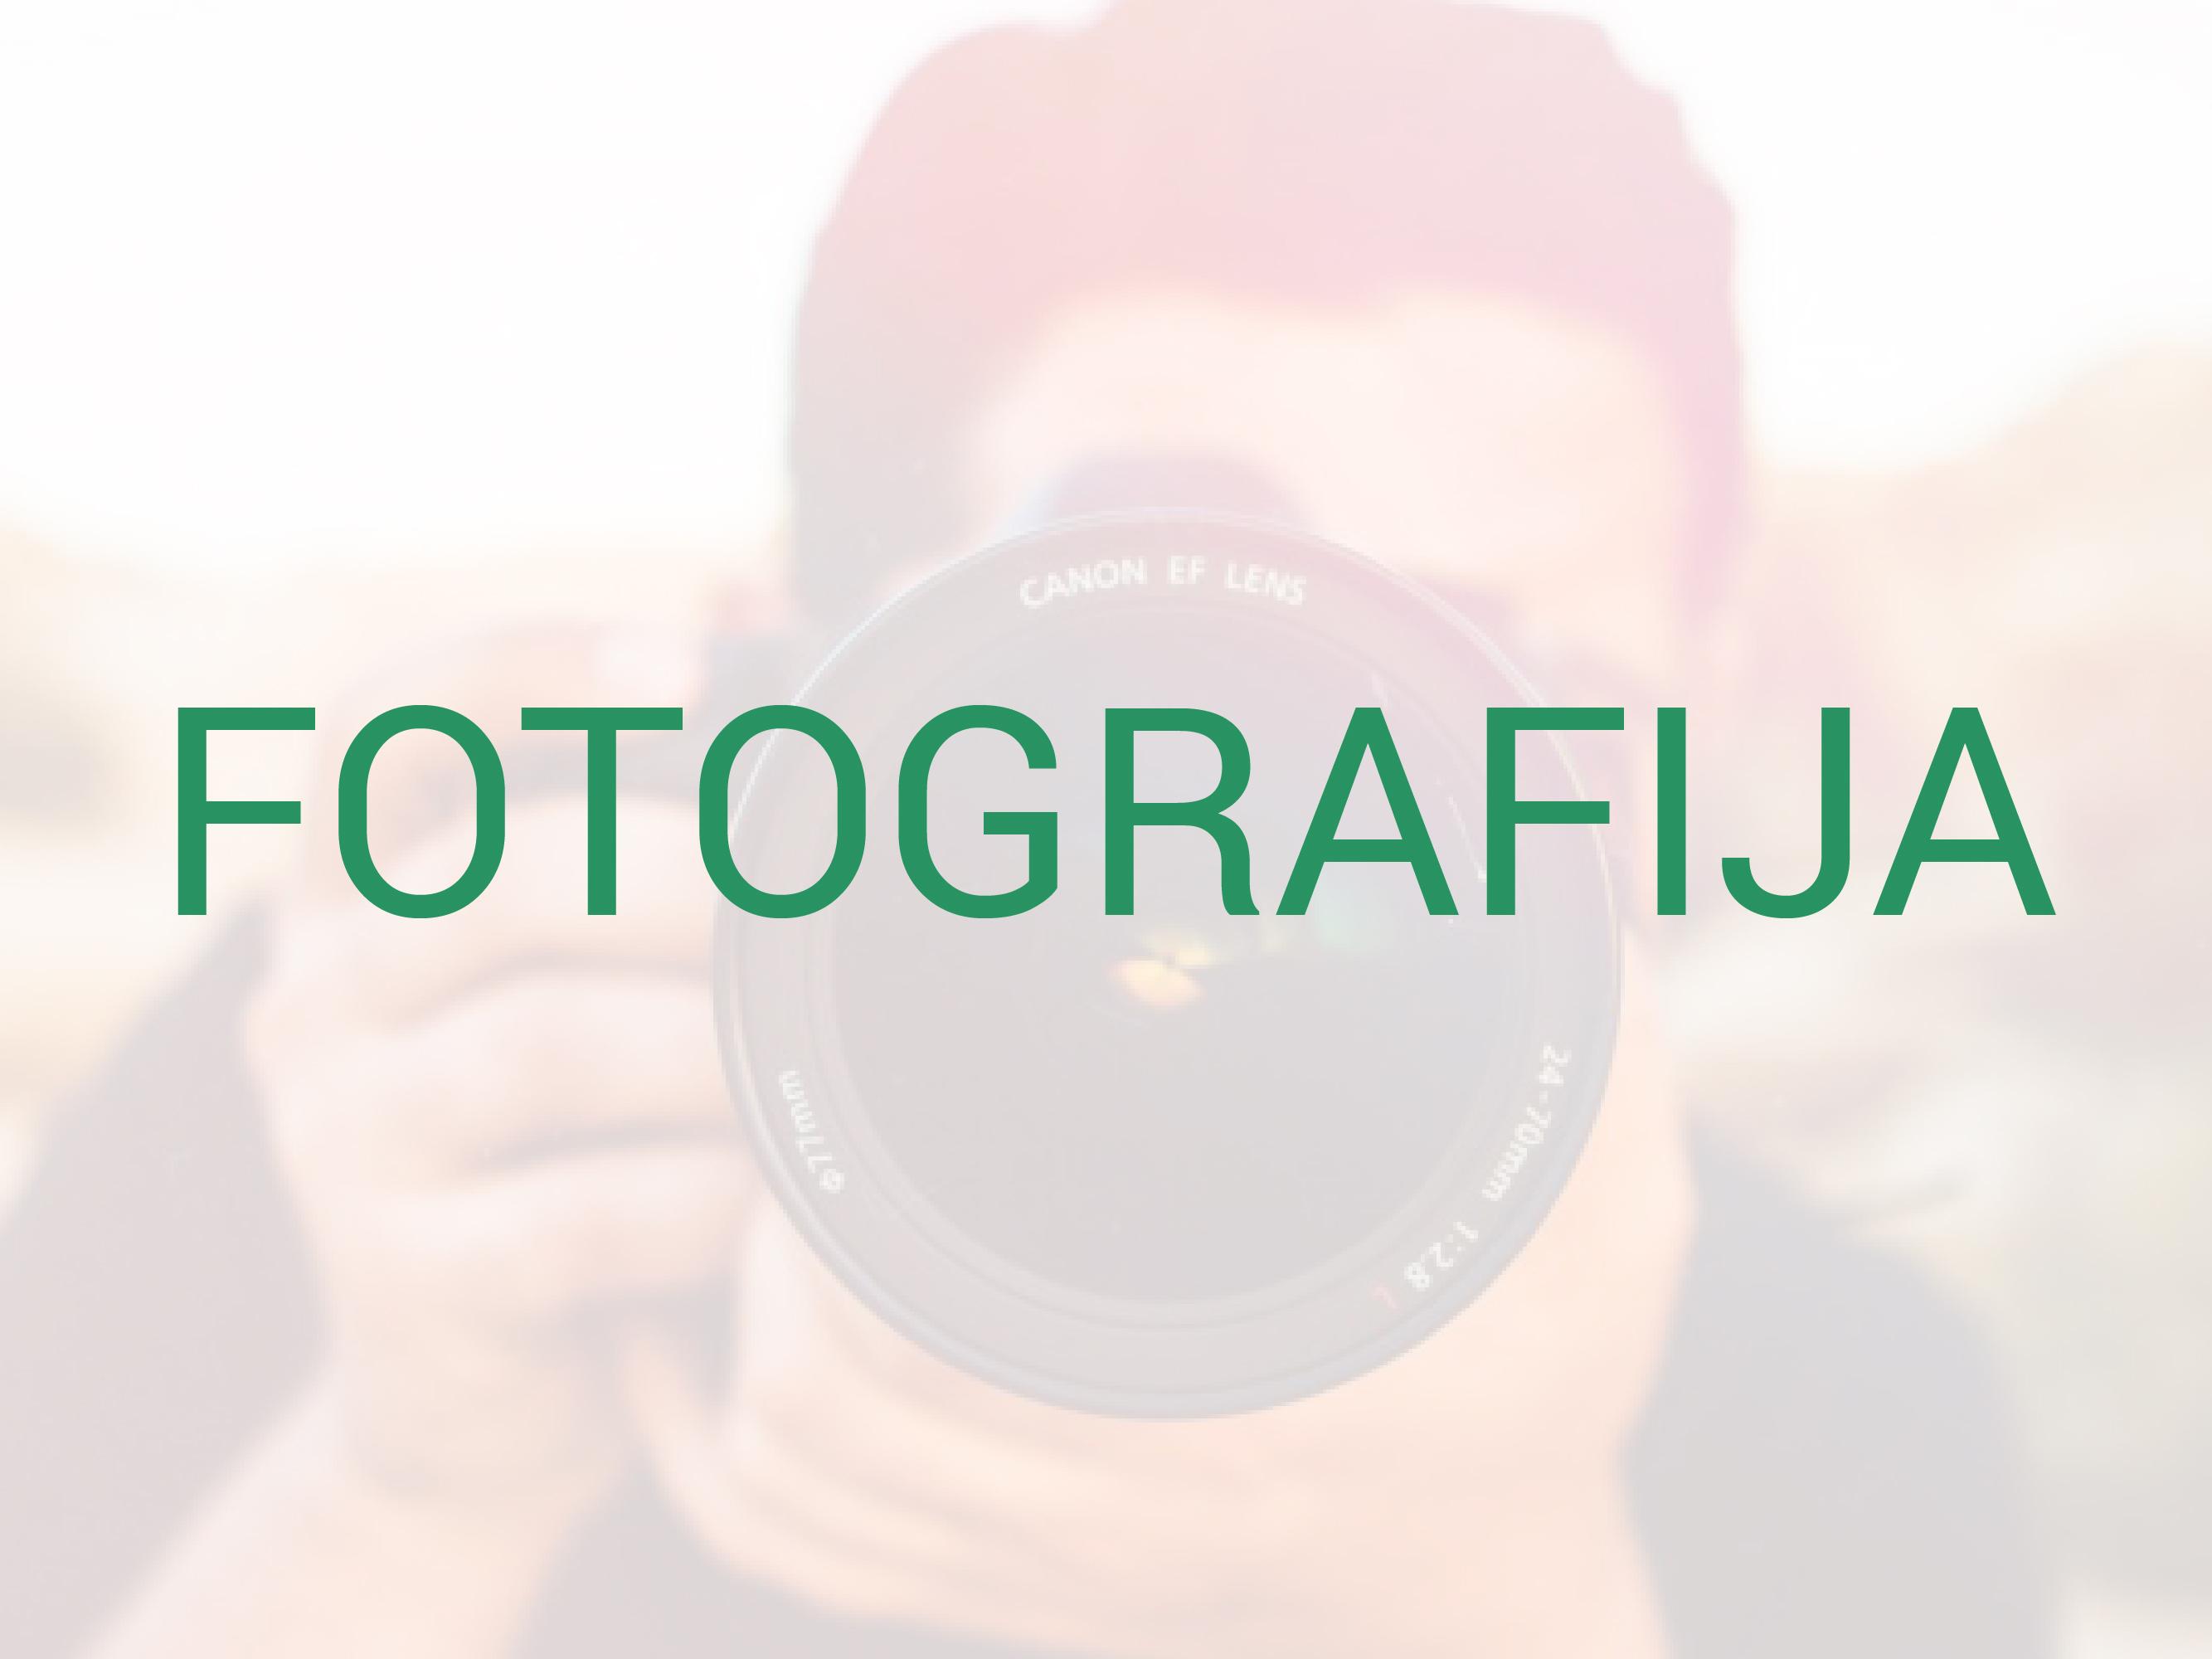 Fotografija-01